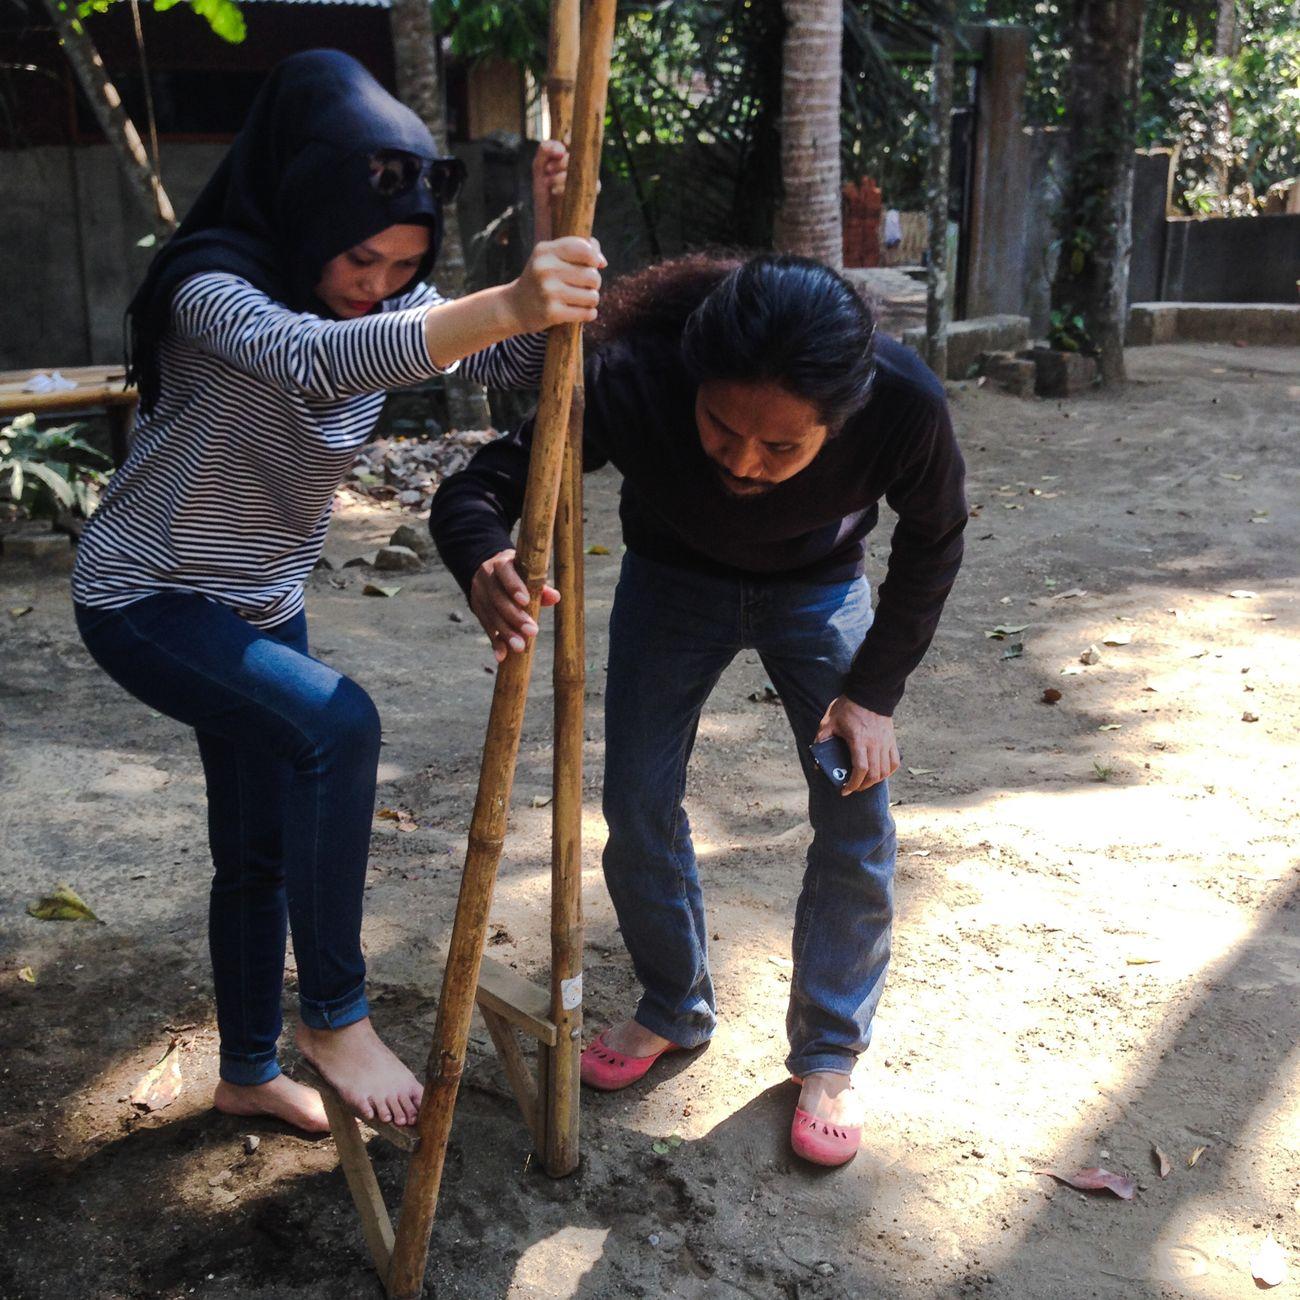 Egrang Egrang Tanoker Wisatajember Pesonajember Pesonaindonesia Traveling Wonderful Indonesia INDONESIA Travel